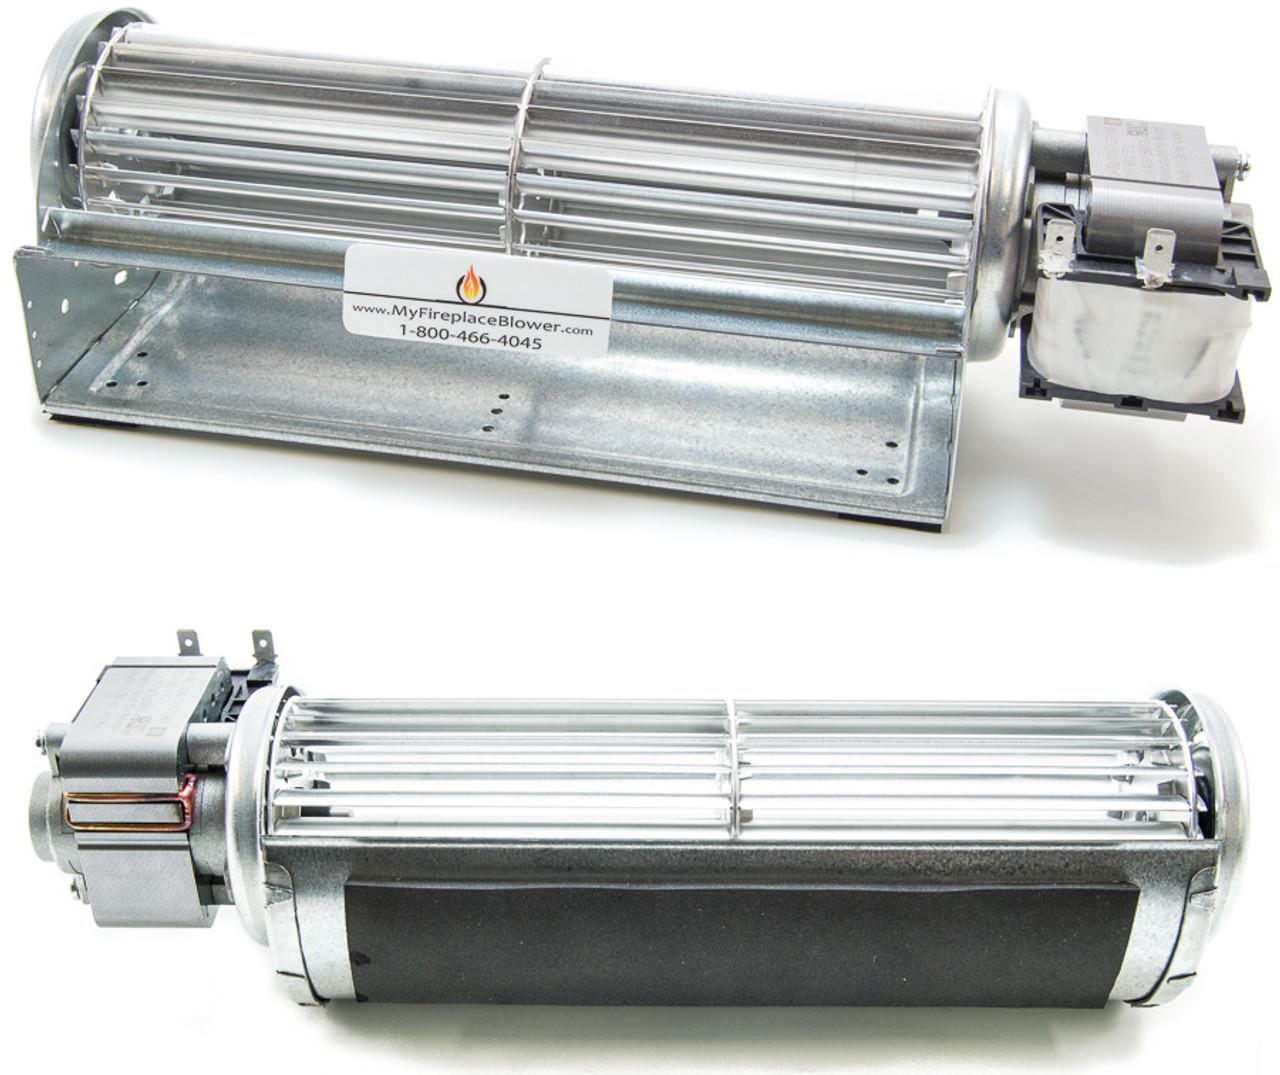 medium resolution of  gfk4b fireplace blower motor for heatilator ndv3933 ndv3933i fireplaces